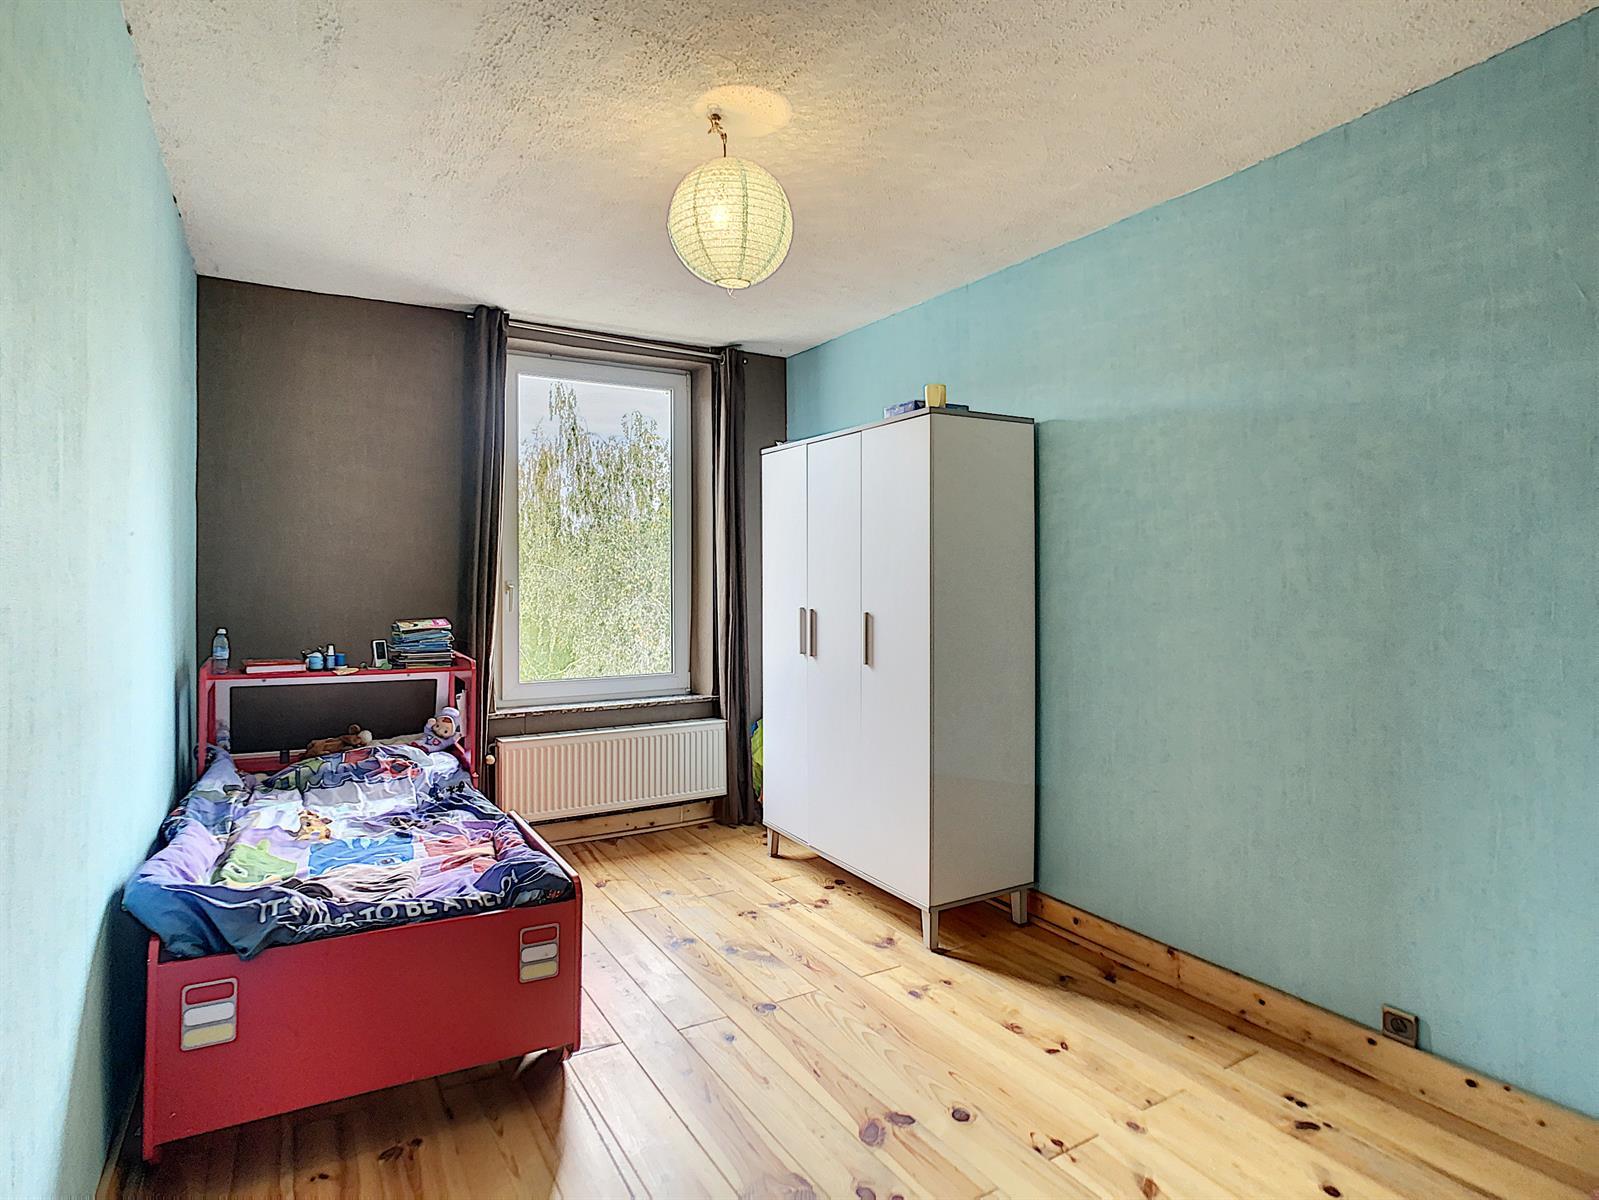 Maison - Charleroi Montsur-Marchienne - #4186318-20